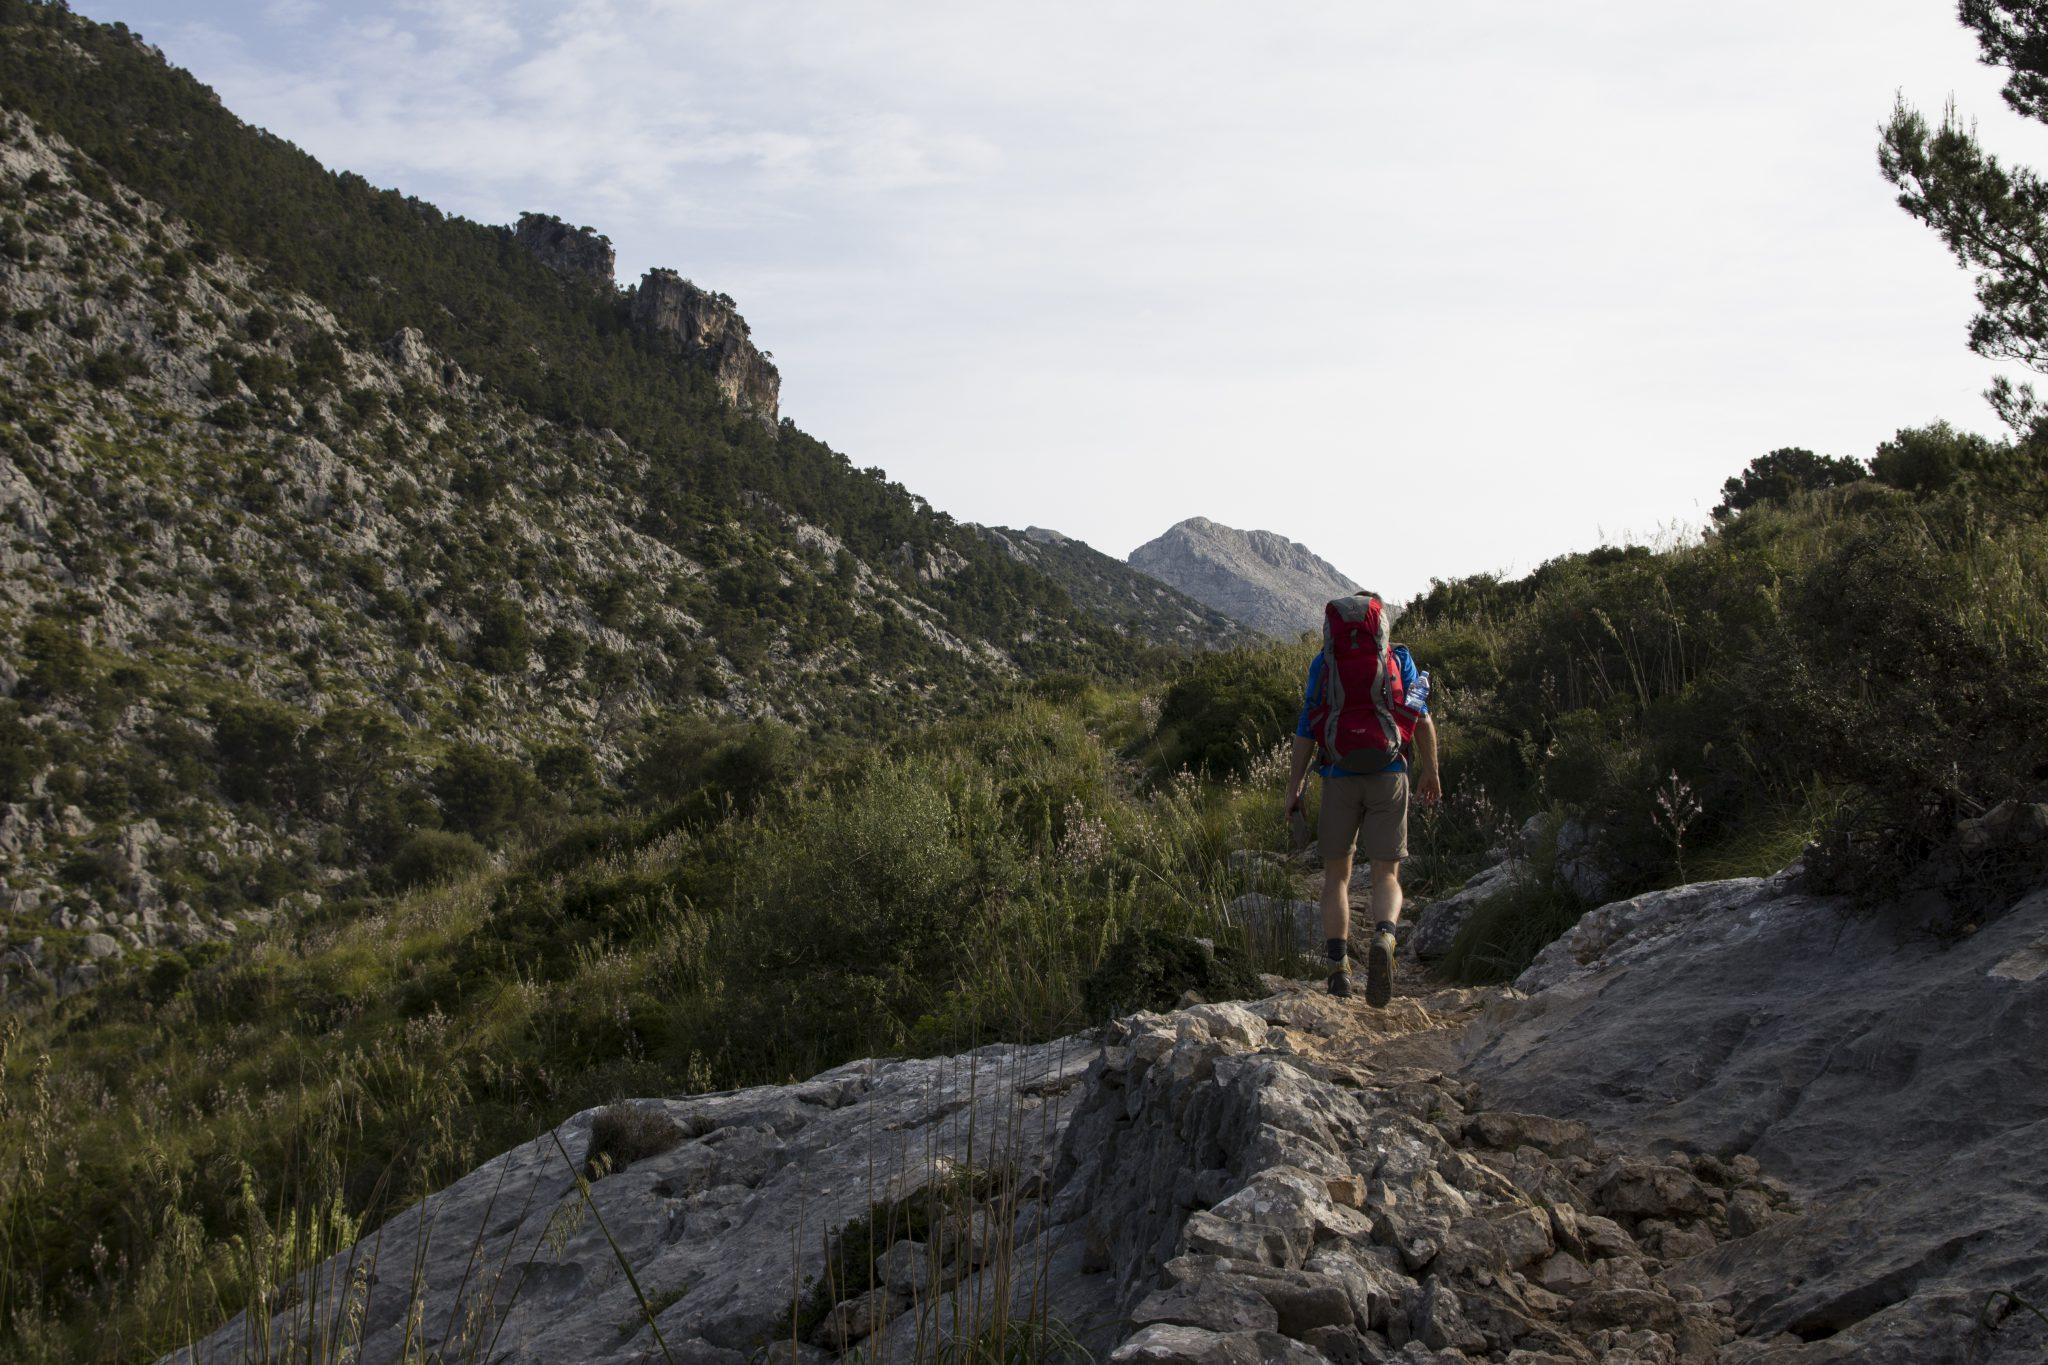 Mallorca, Tramuntana, GR221, Wandern, Wanderung, Trekking